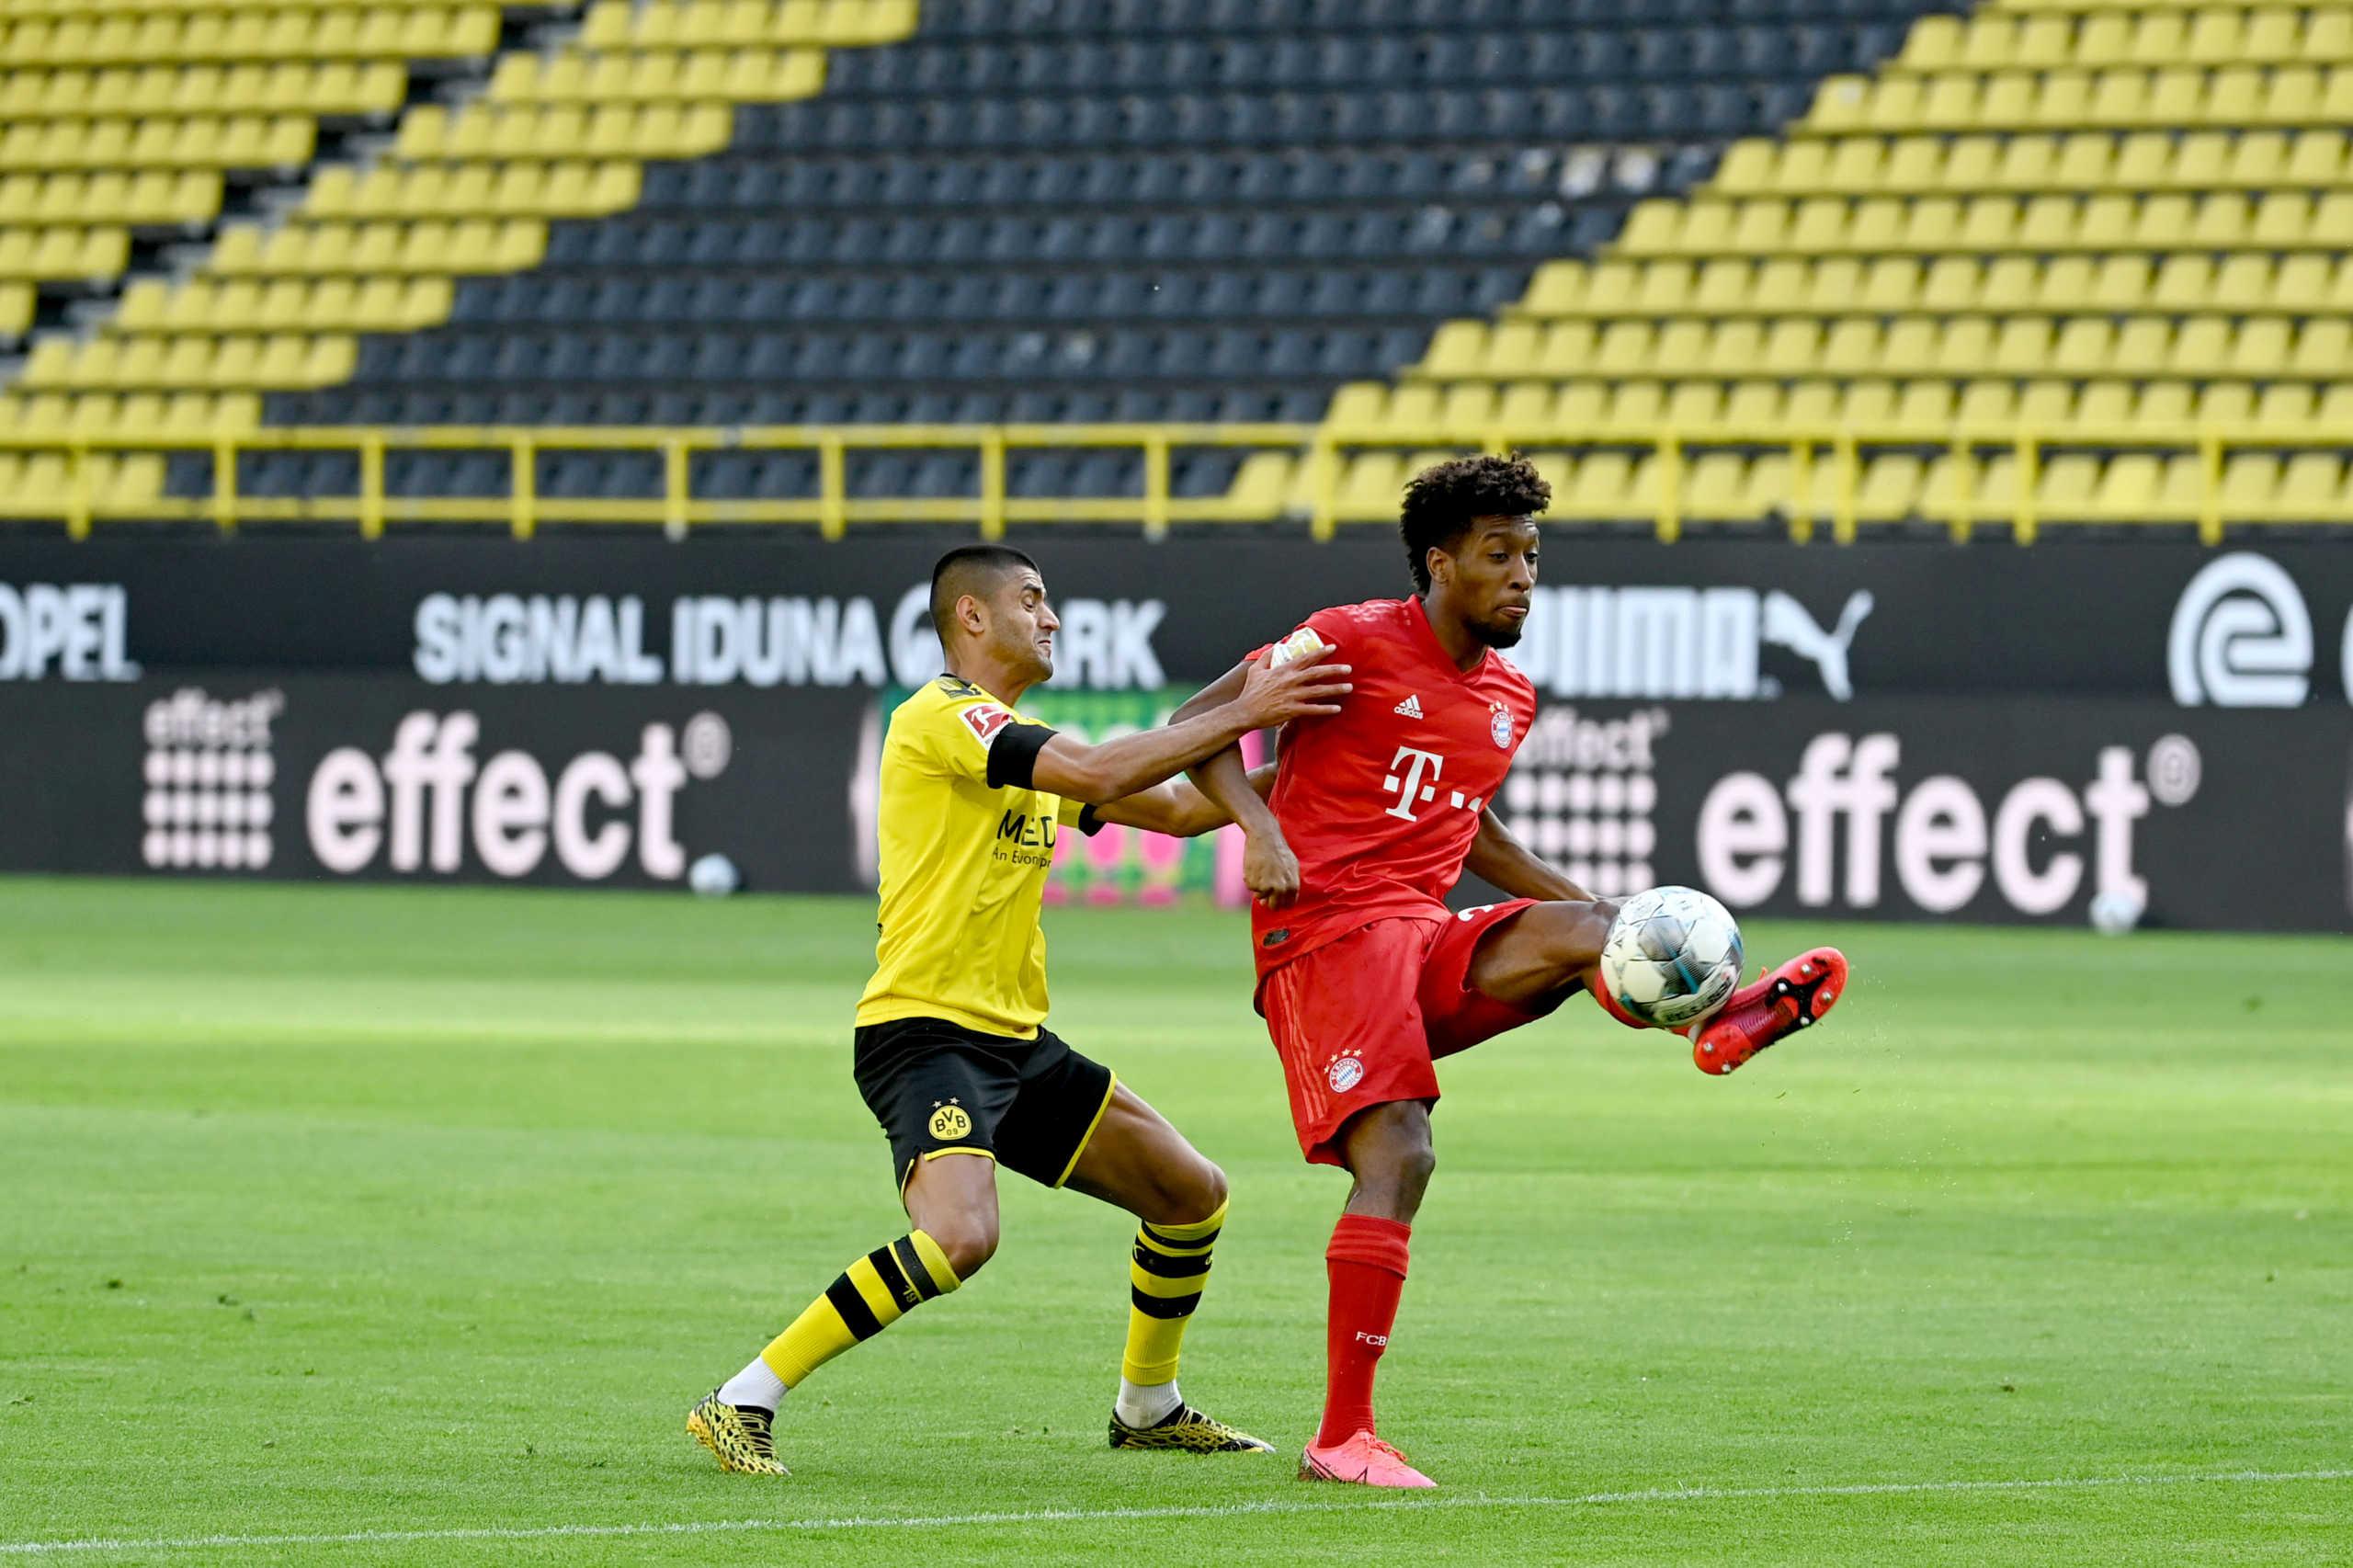 Bundesliga: Γκολάρα με… γκέλα στο ντέρμπι τίτλου της Γερμανίας (video)